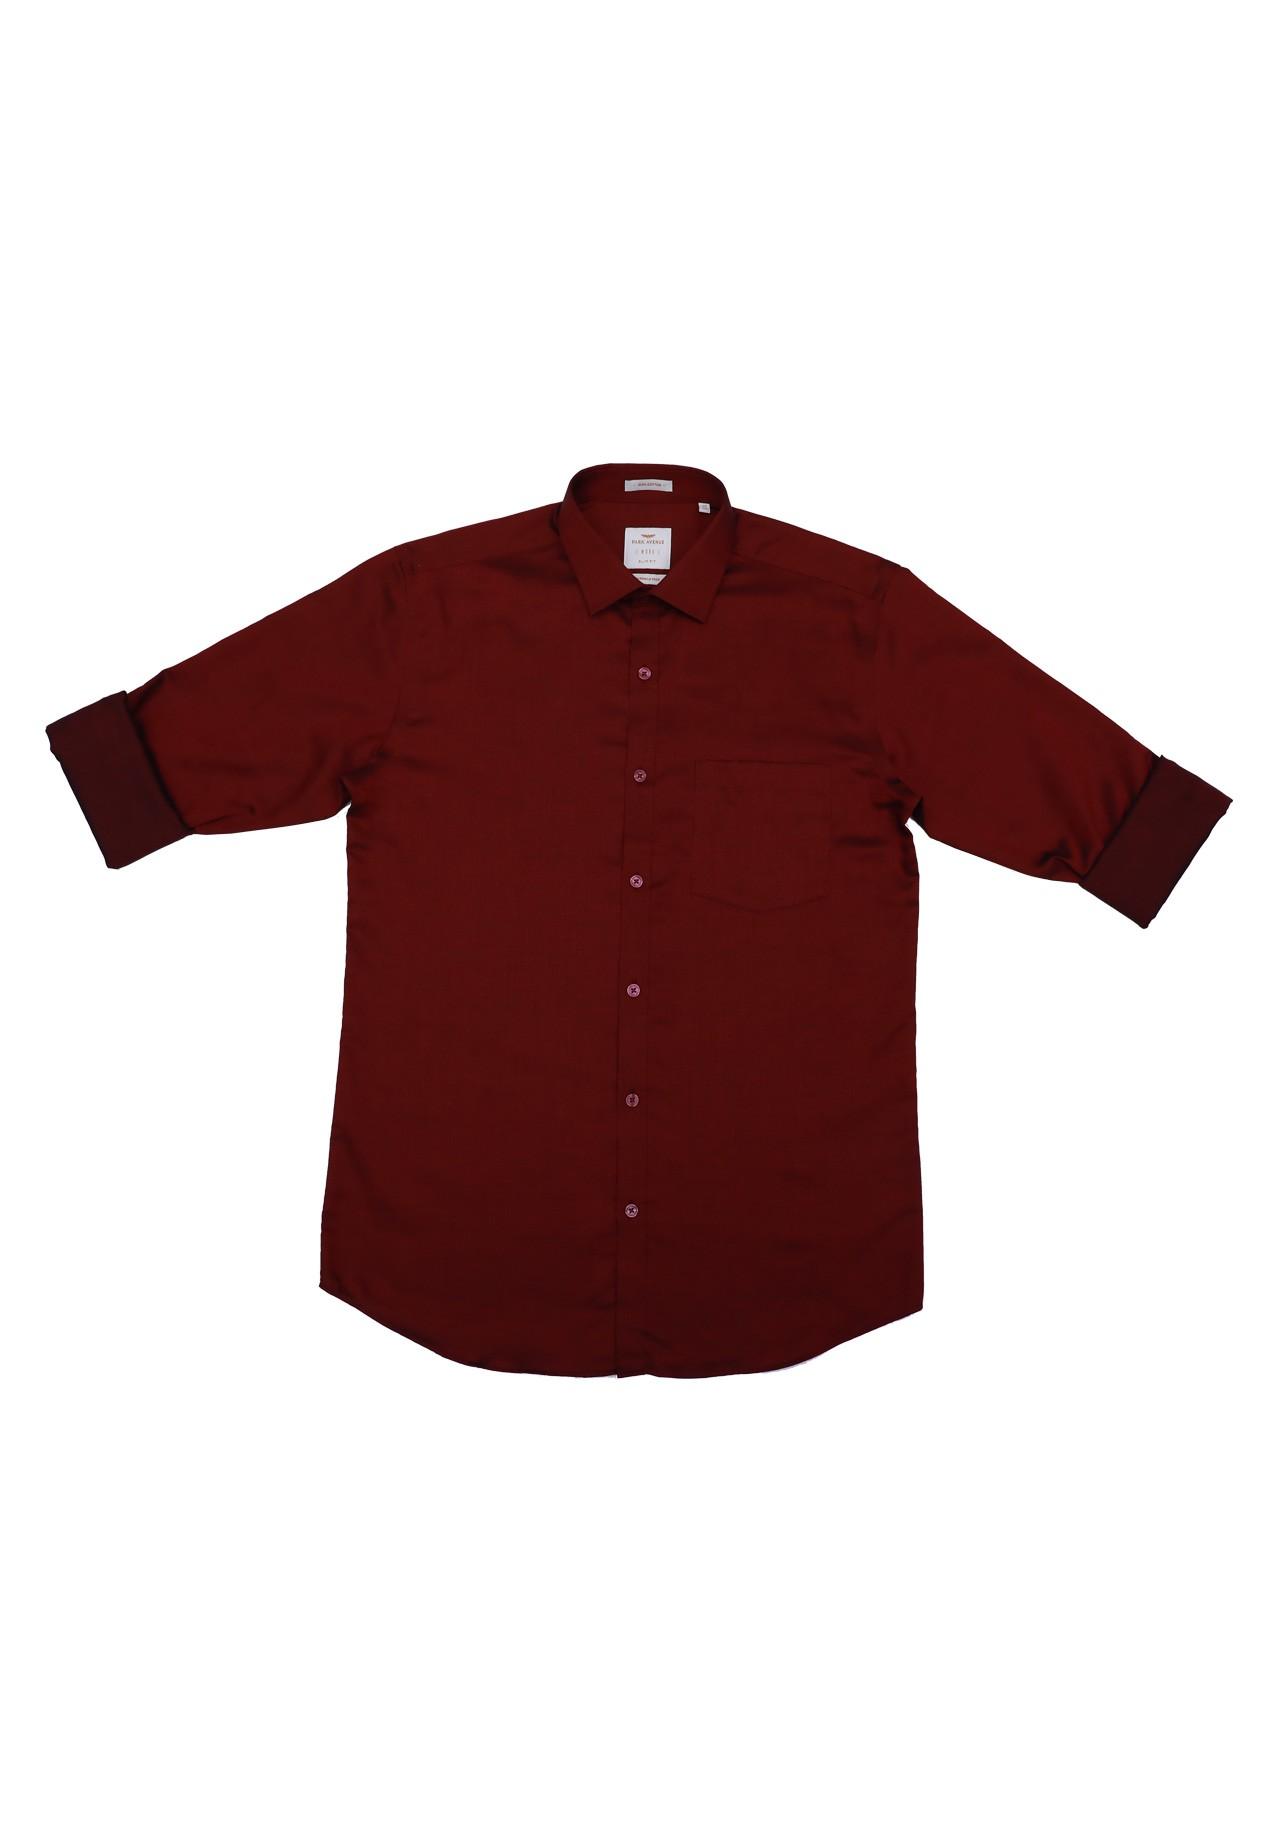 Park Avenue PMSX12185-R8 Mens Shirt